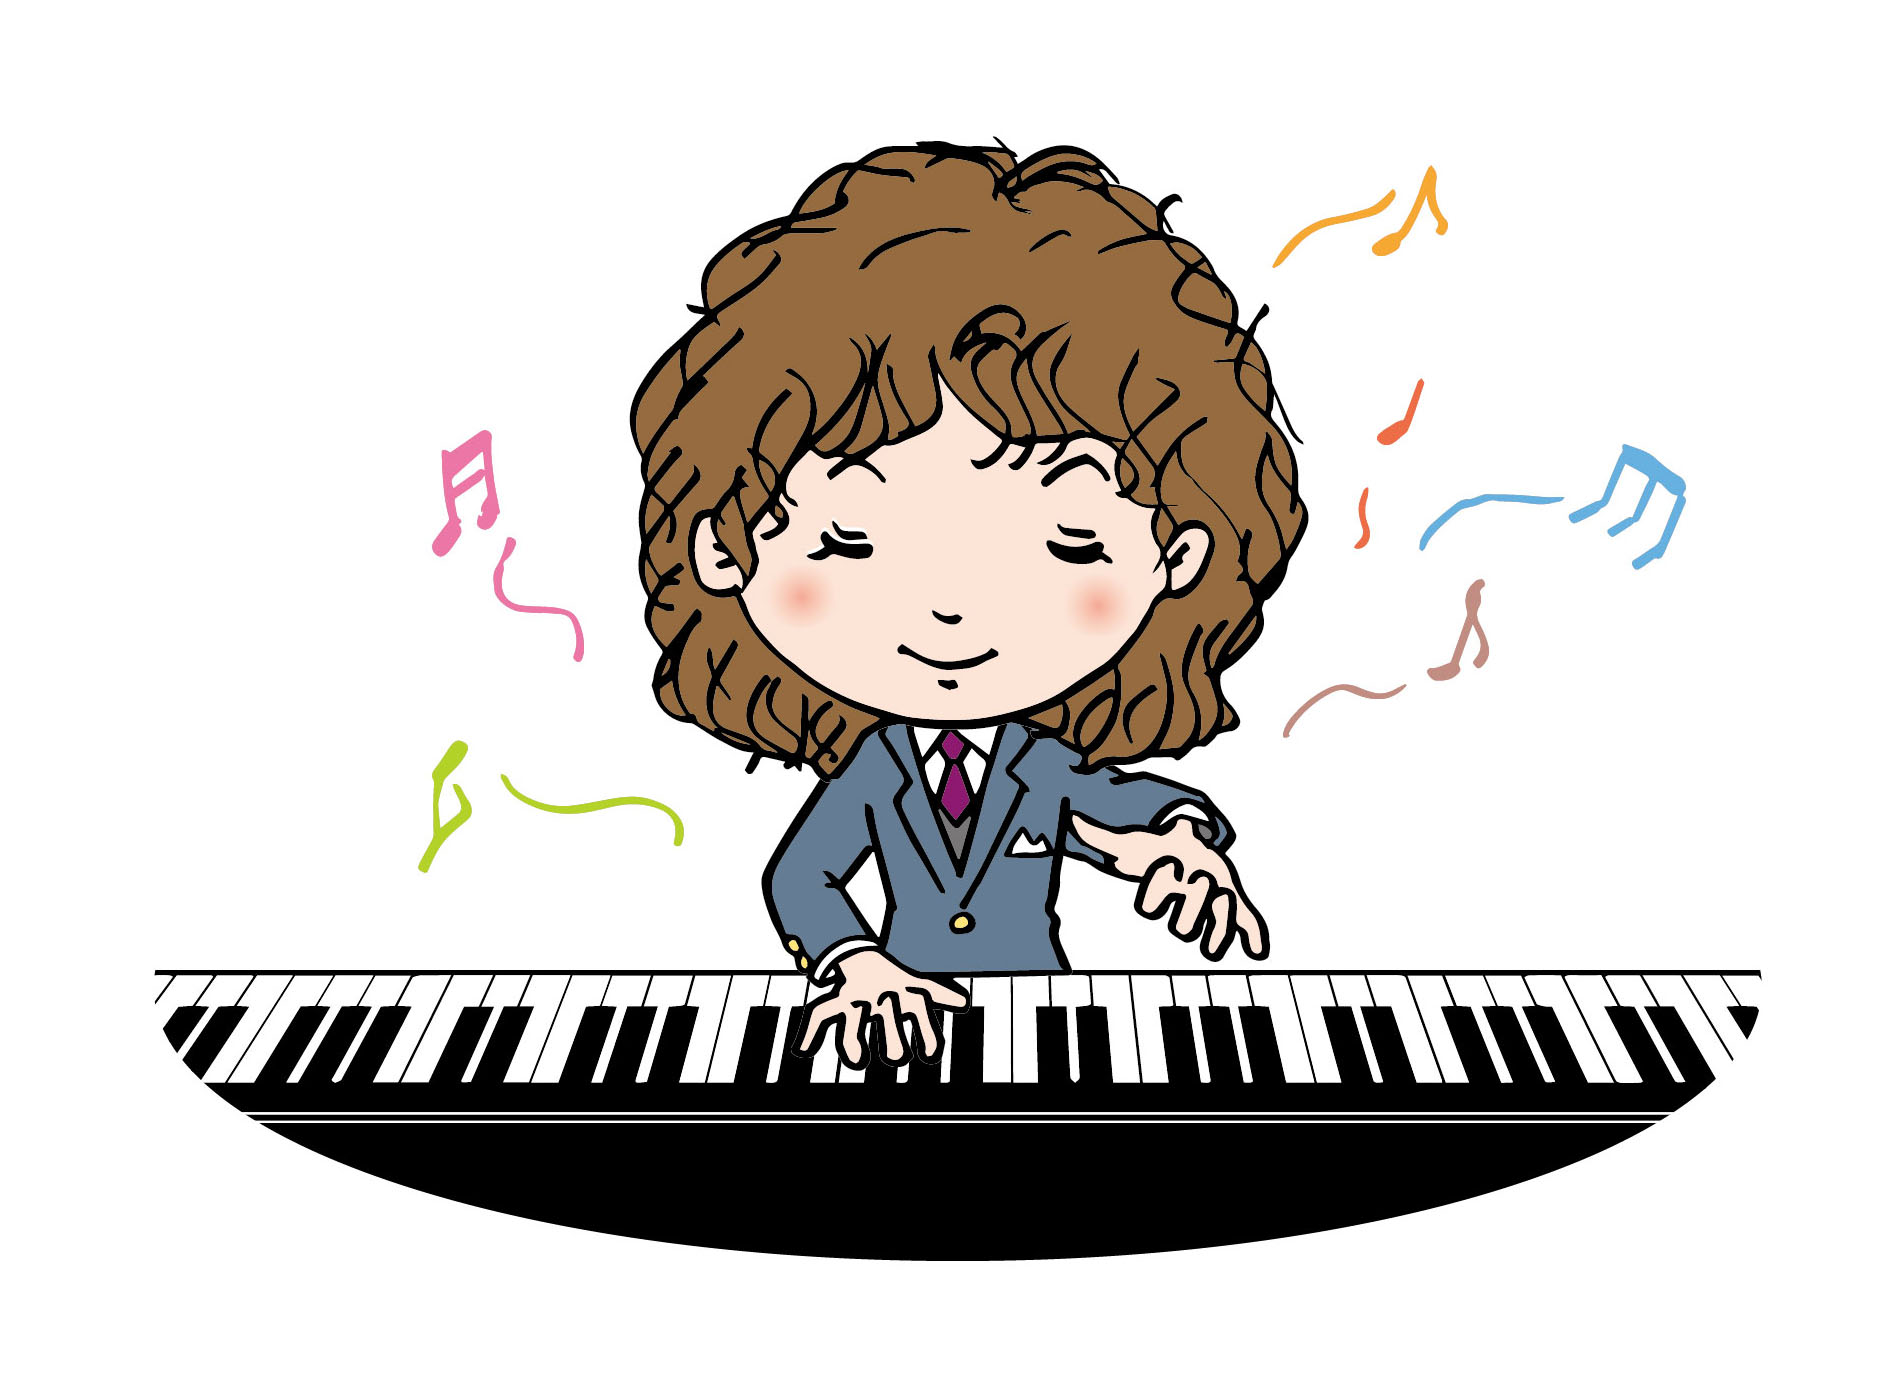 ADHDの性質によるプラス面とマイナス面。ピアノコンクール優勝など